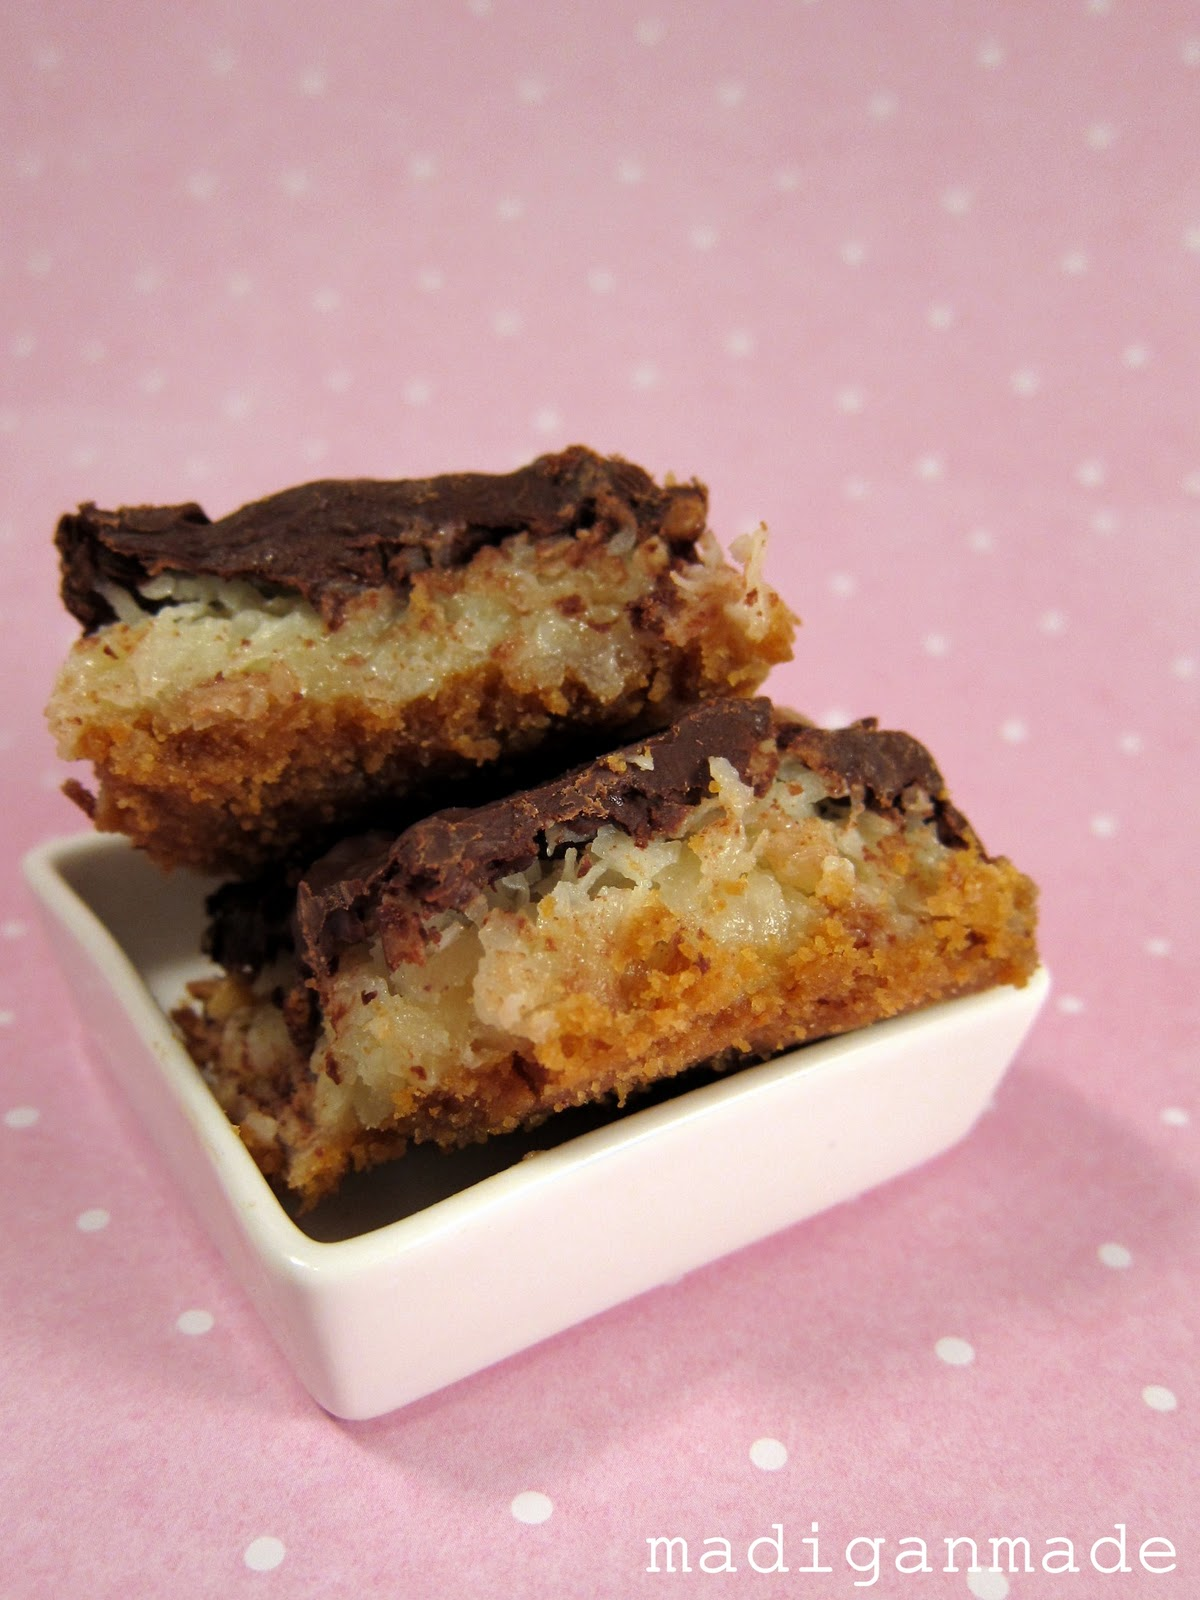 http://i2.wp.com/4.bp.blogspot.com/_xd5aEjCcjL4/TUmVELw_HpI/AAAAAAAABcE/a9z9PuZlReQ/s1600/coconut+mounds+chocolate+bars.JPG?resize=399%2C533